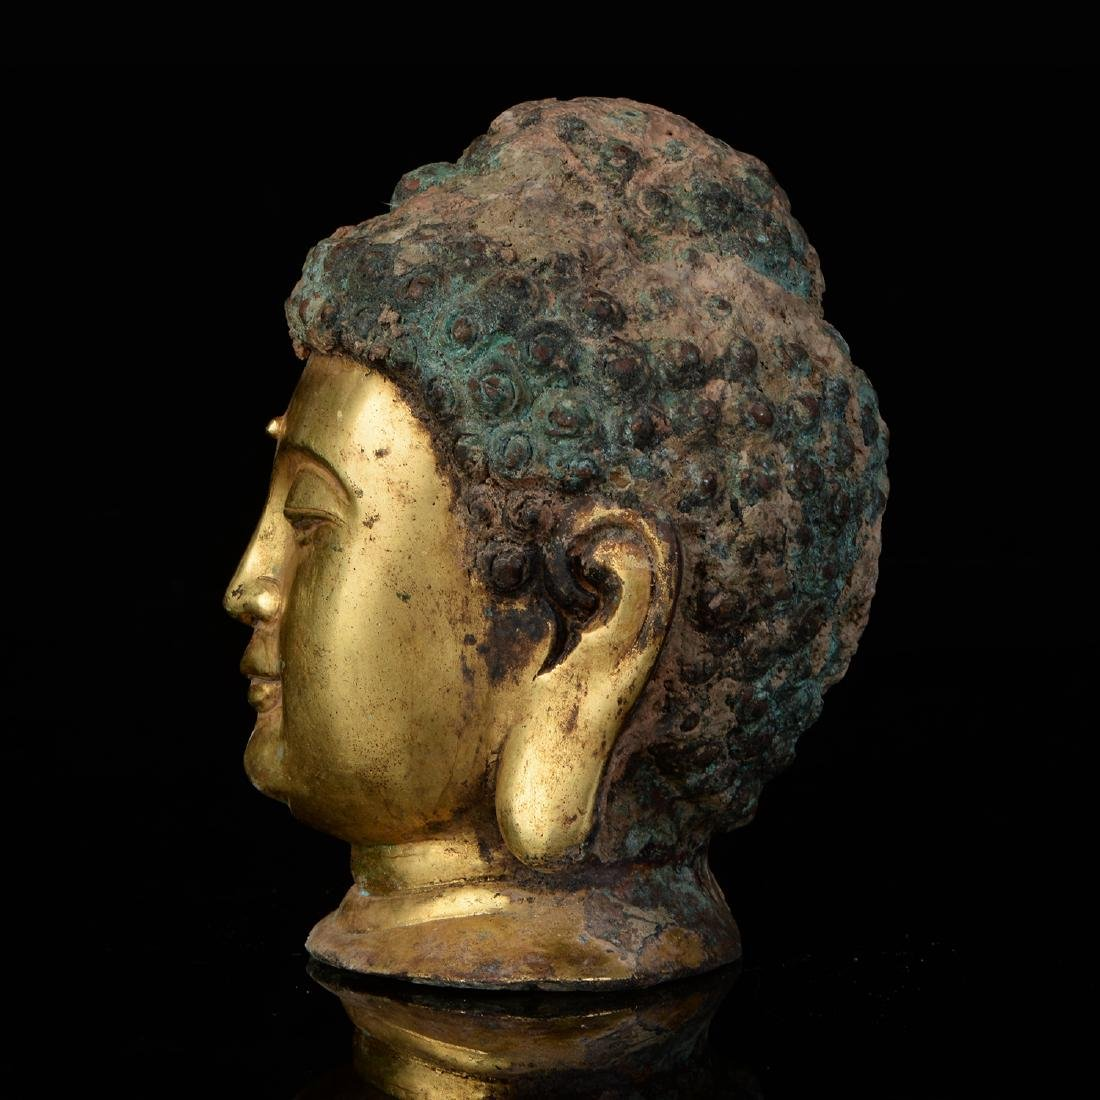 Chinese Qing Dynasty Tibetan Bronze Buddha Head - 2